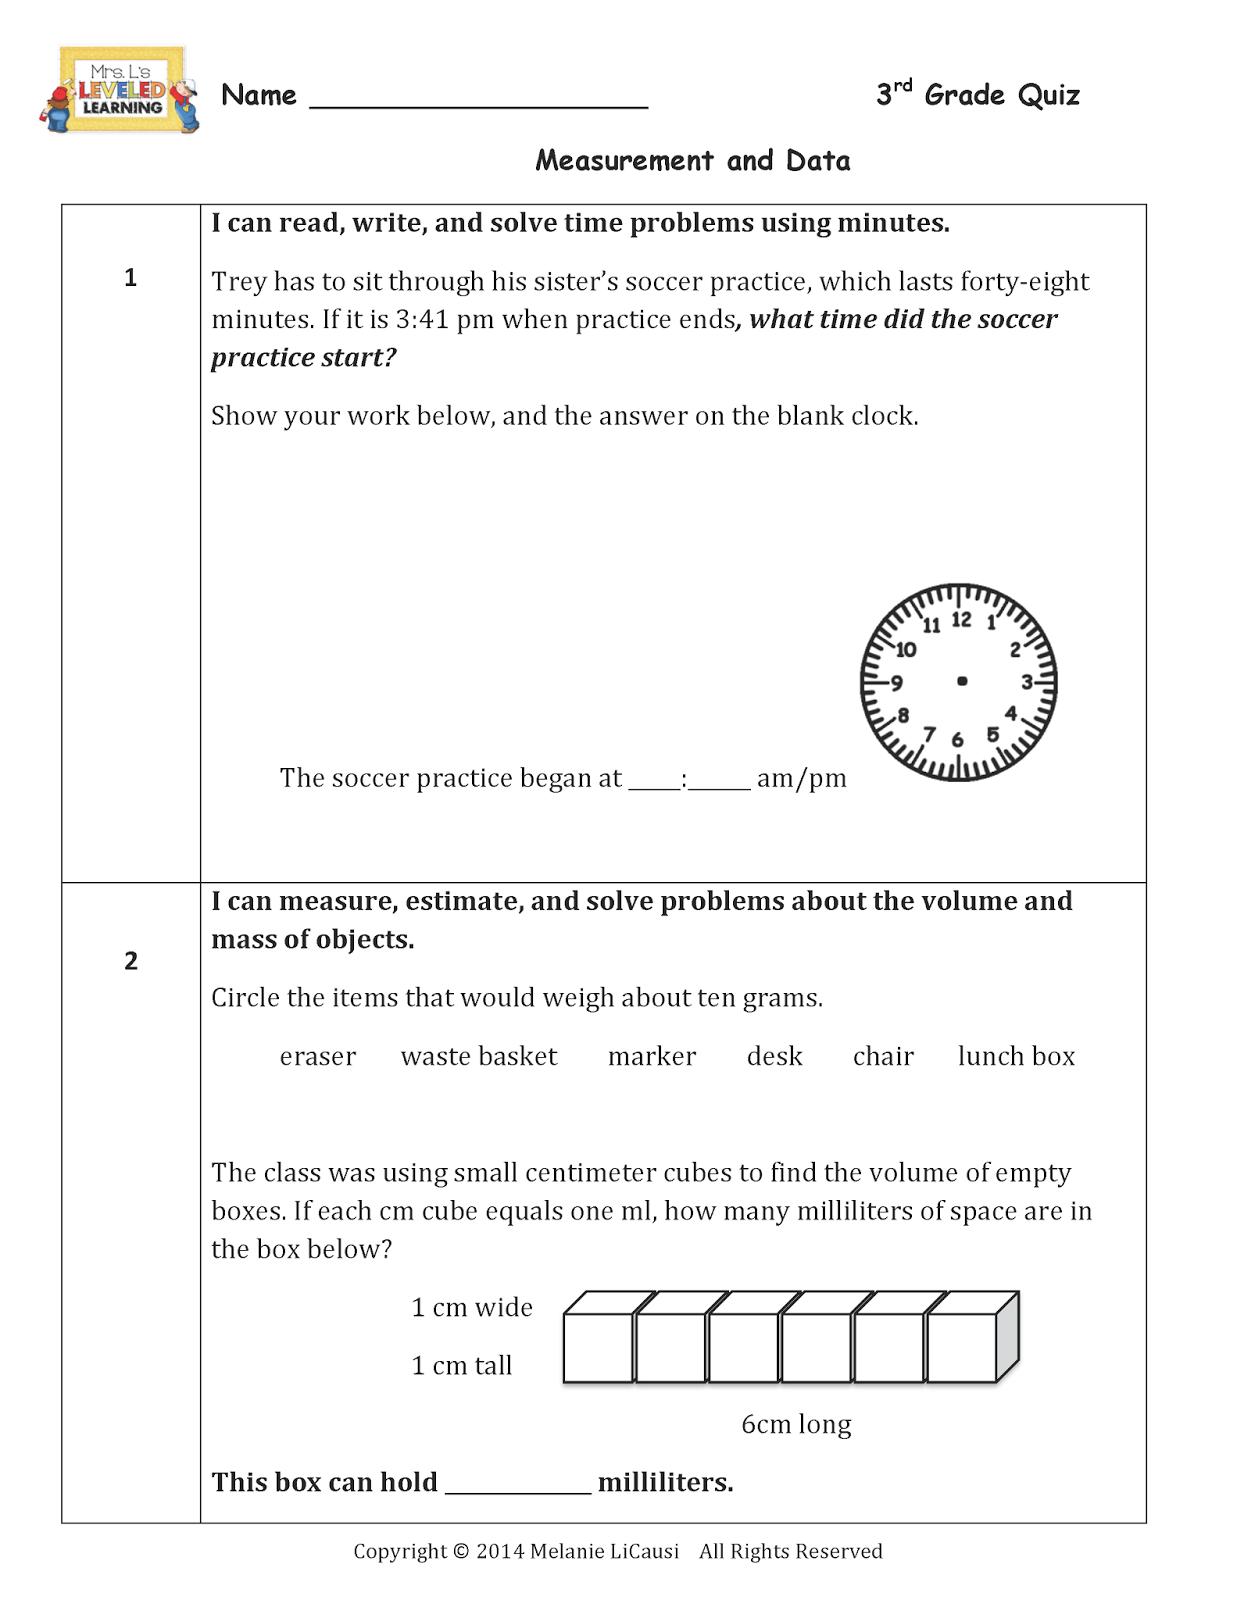 Math Quiz For Grade 3 Free - QUIZ [ 1600 x 1237 Pixel ]